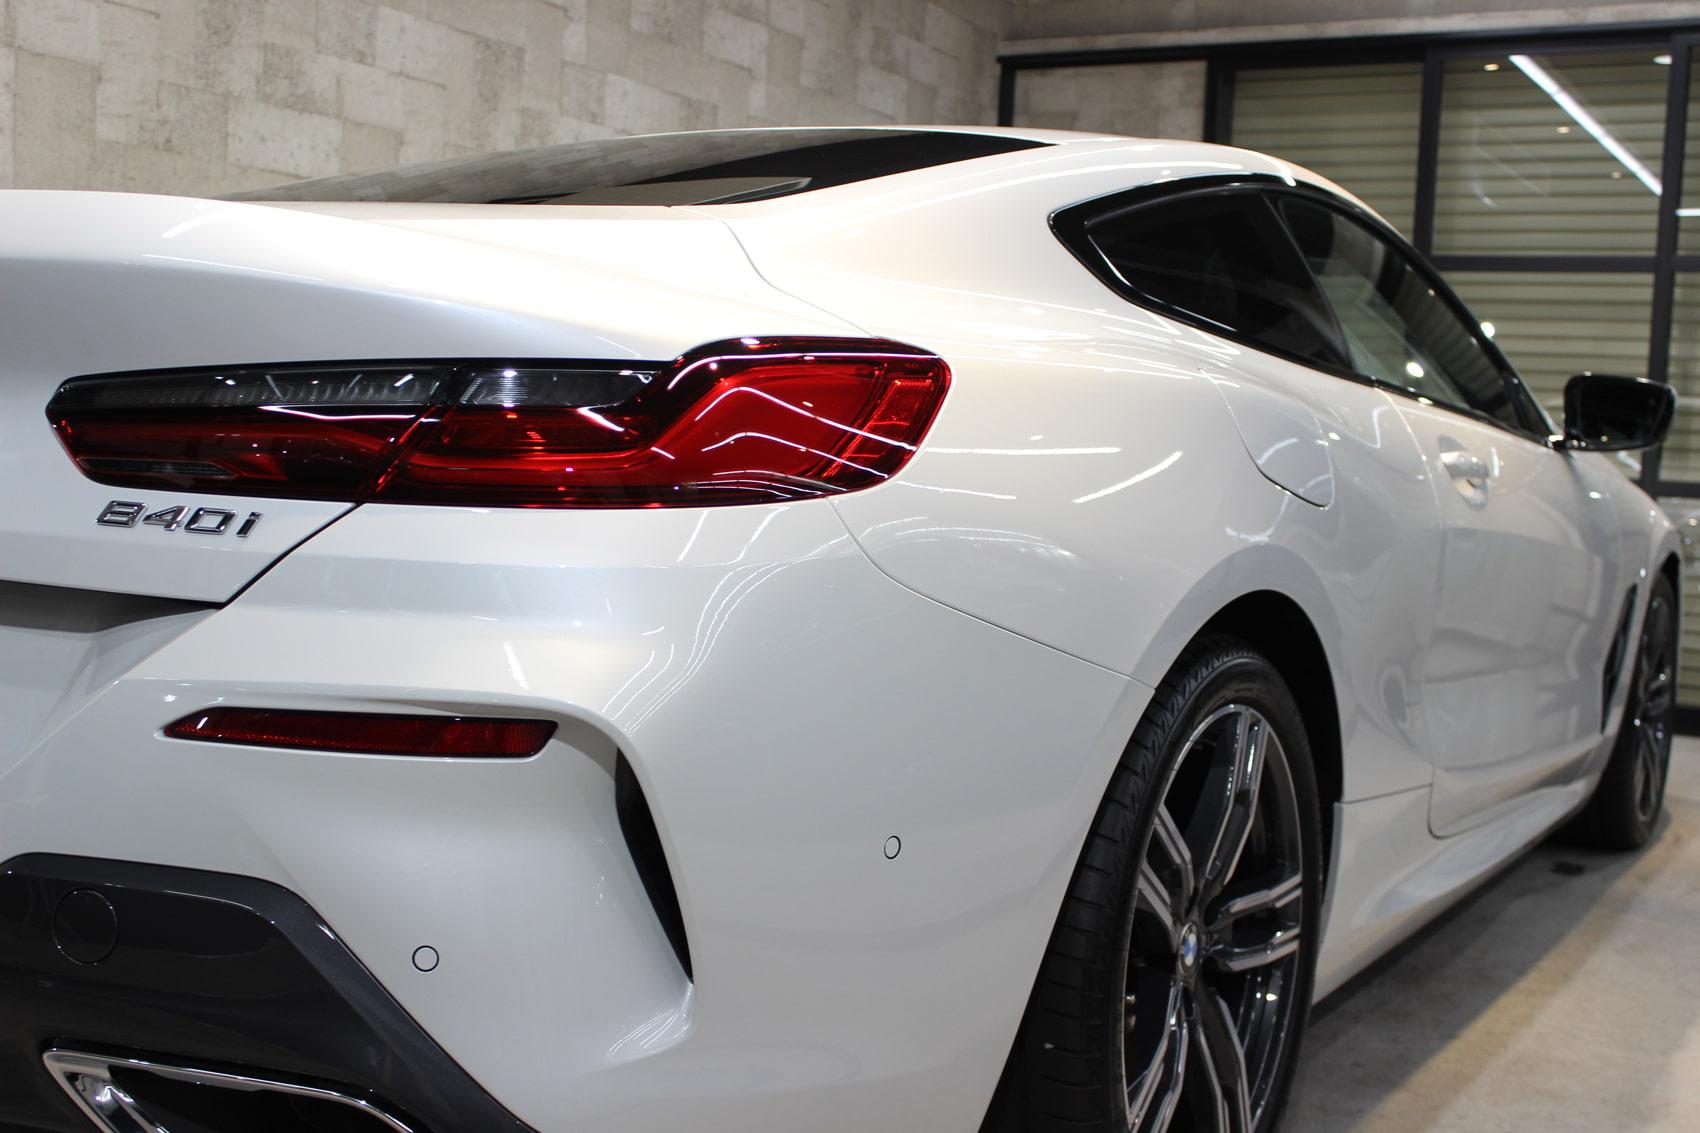 BMW 840iクーペ ミネラルホワイト テールライト